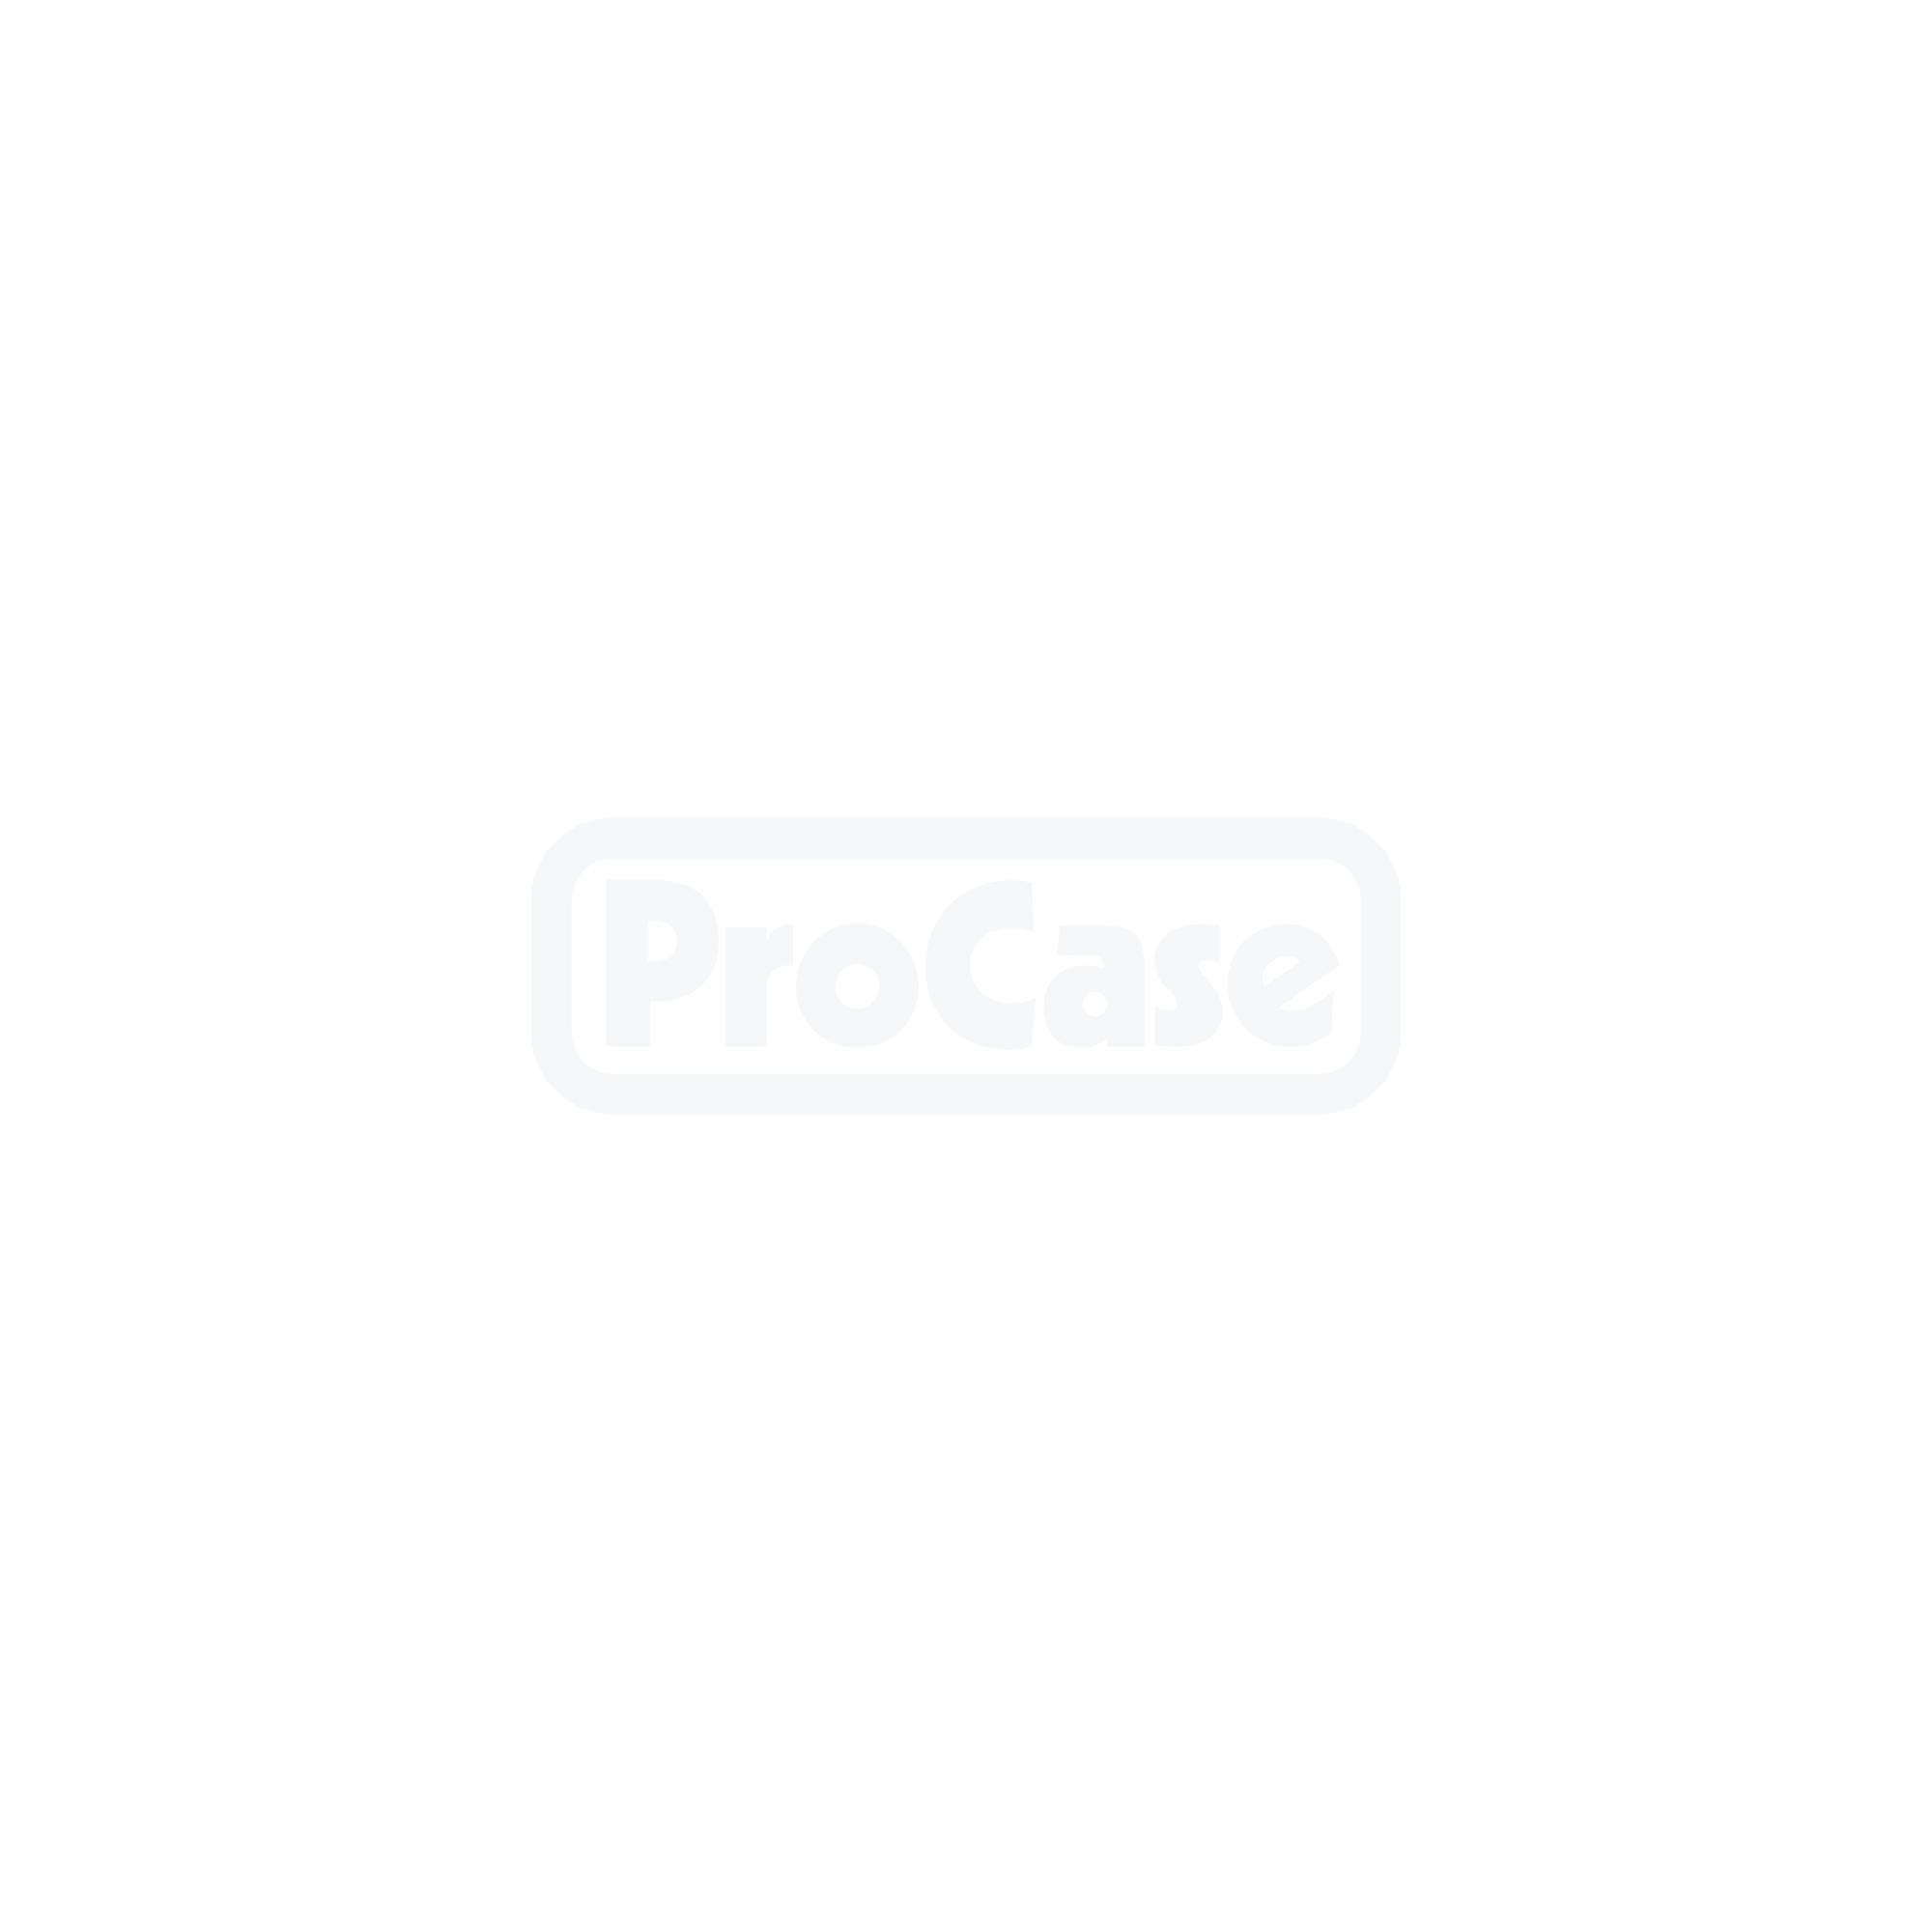 Flipcase für Yamaha Rivage PM7/PM10 3